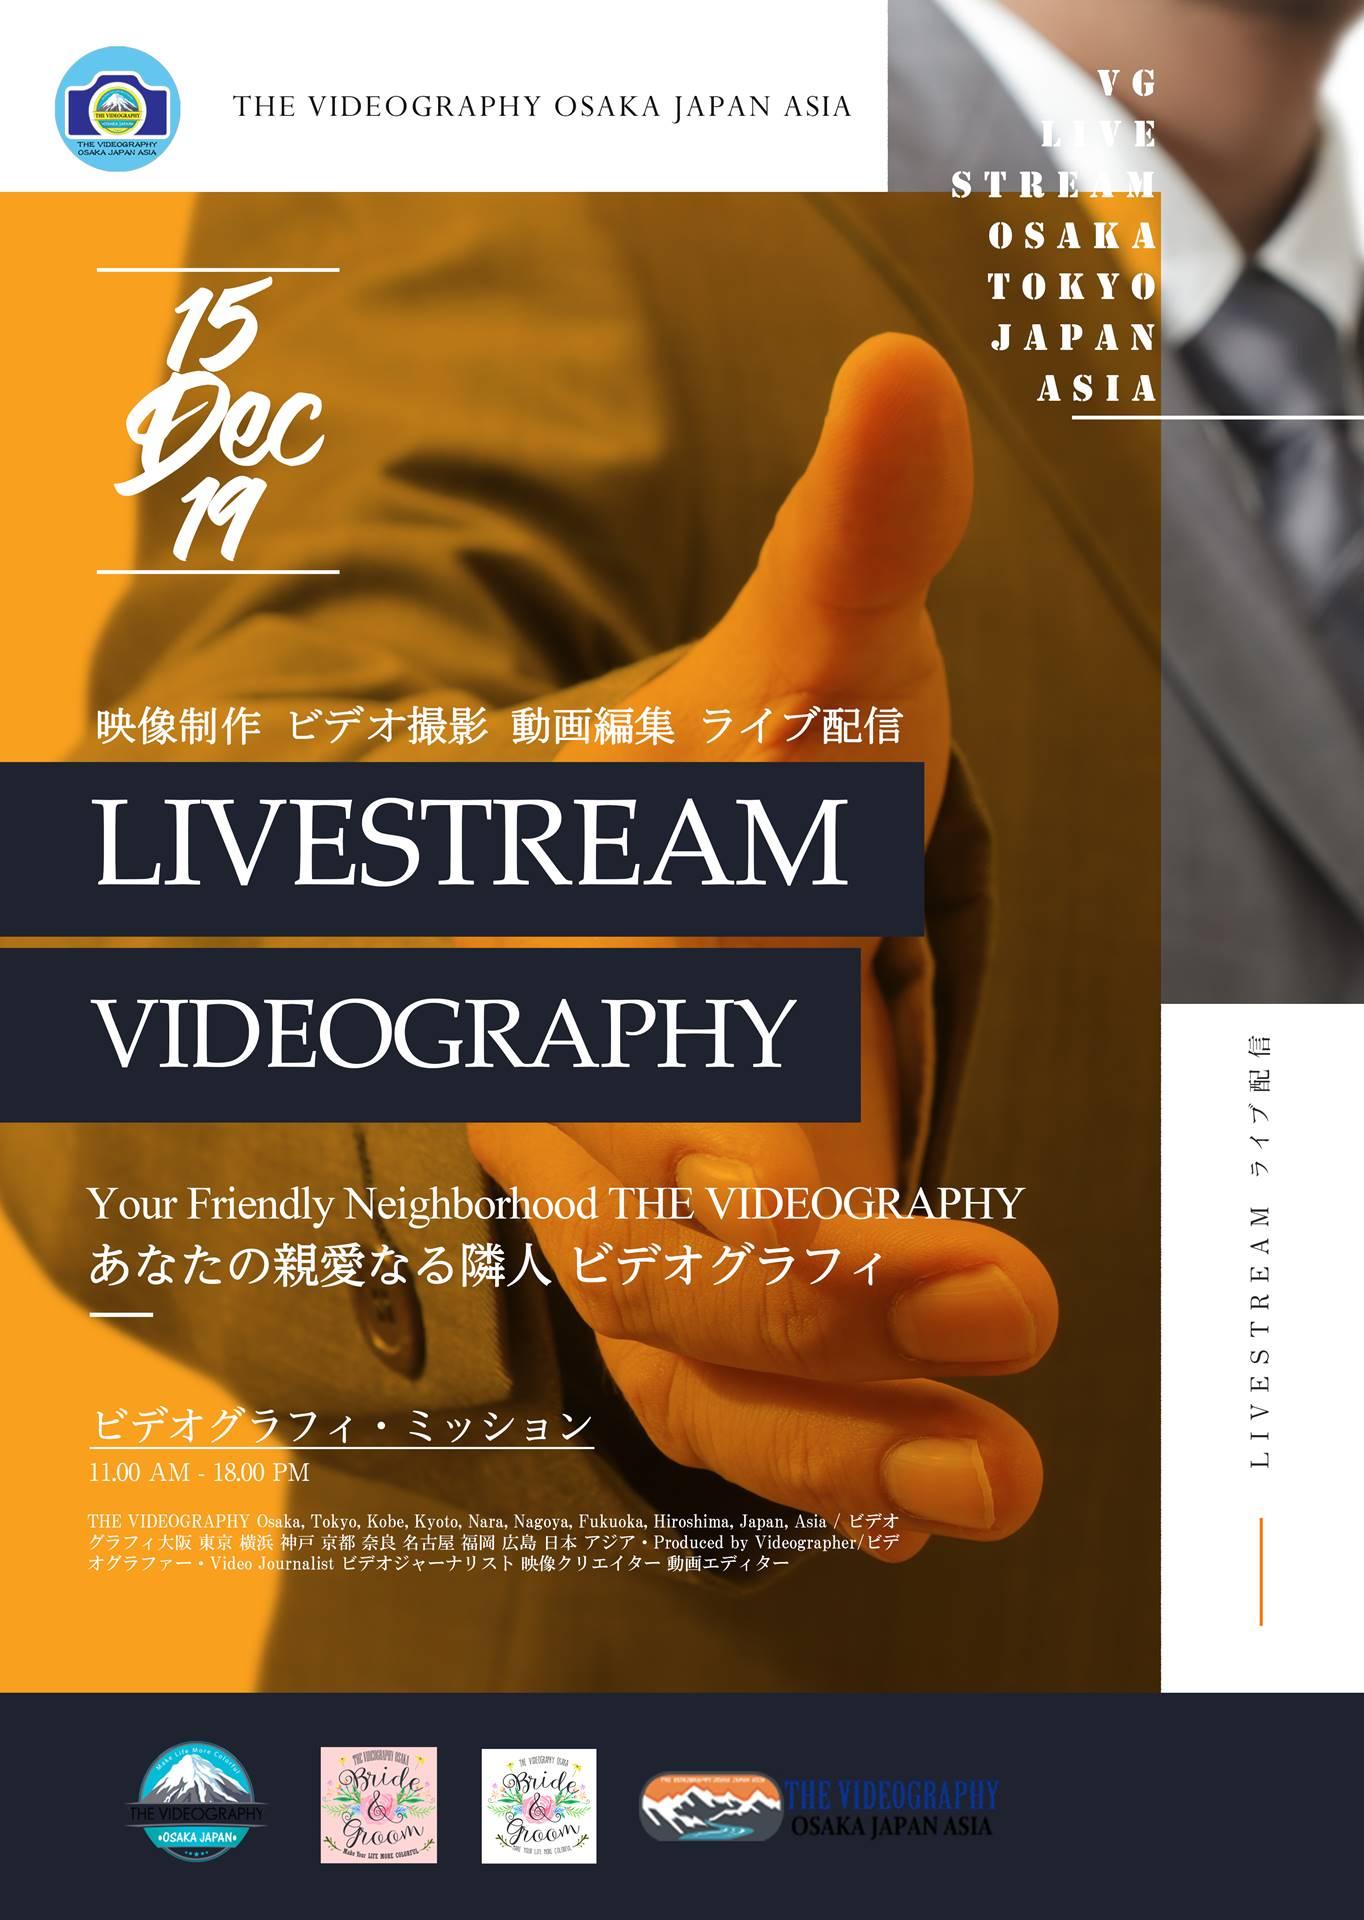 WOL・Webinar on Livestream